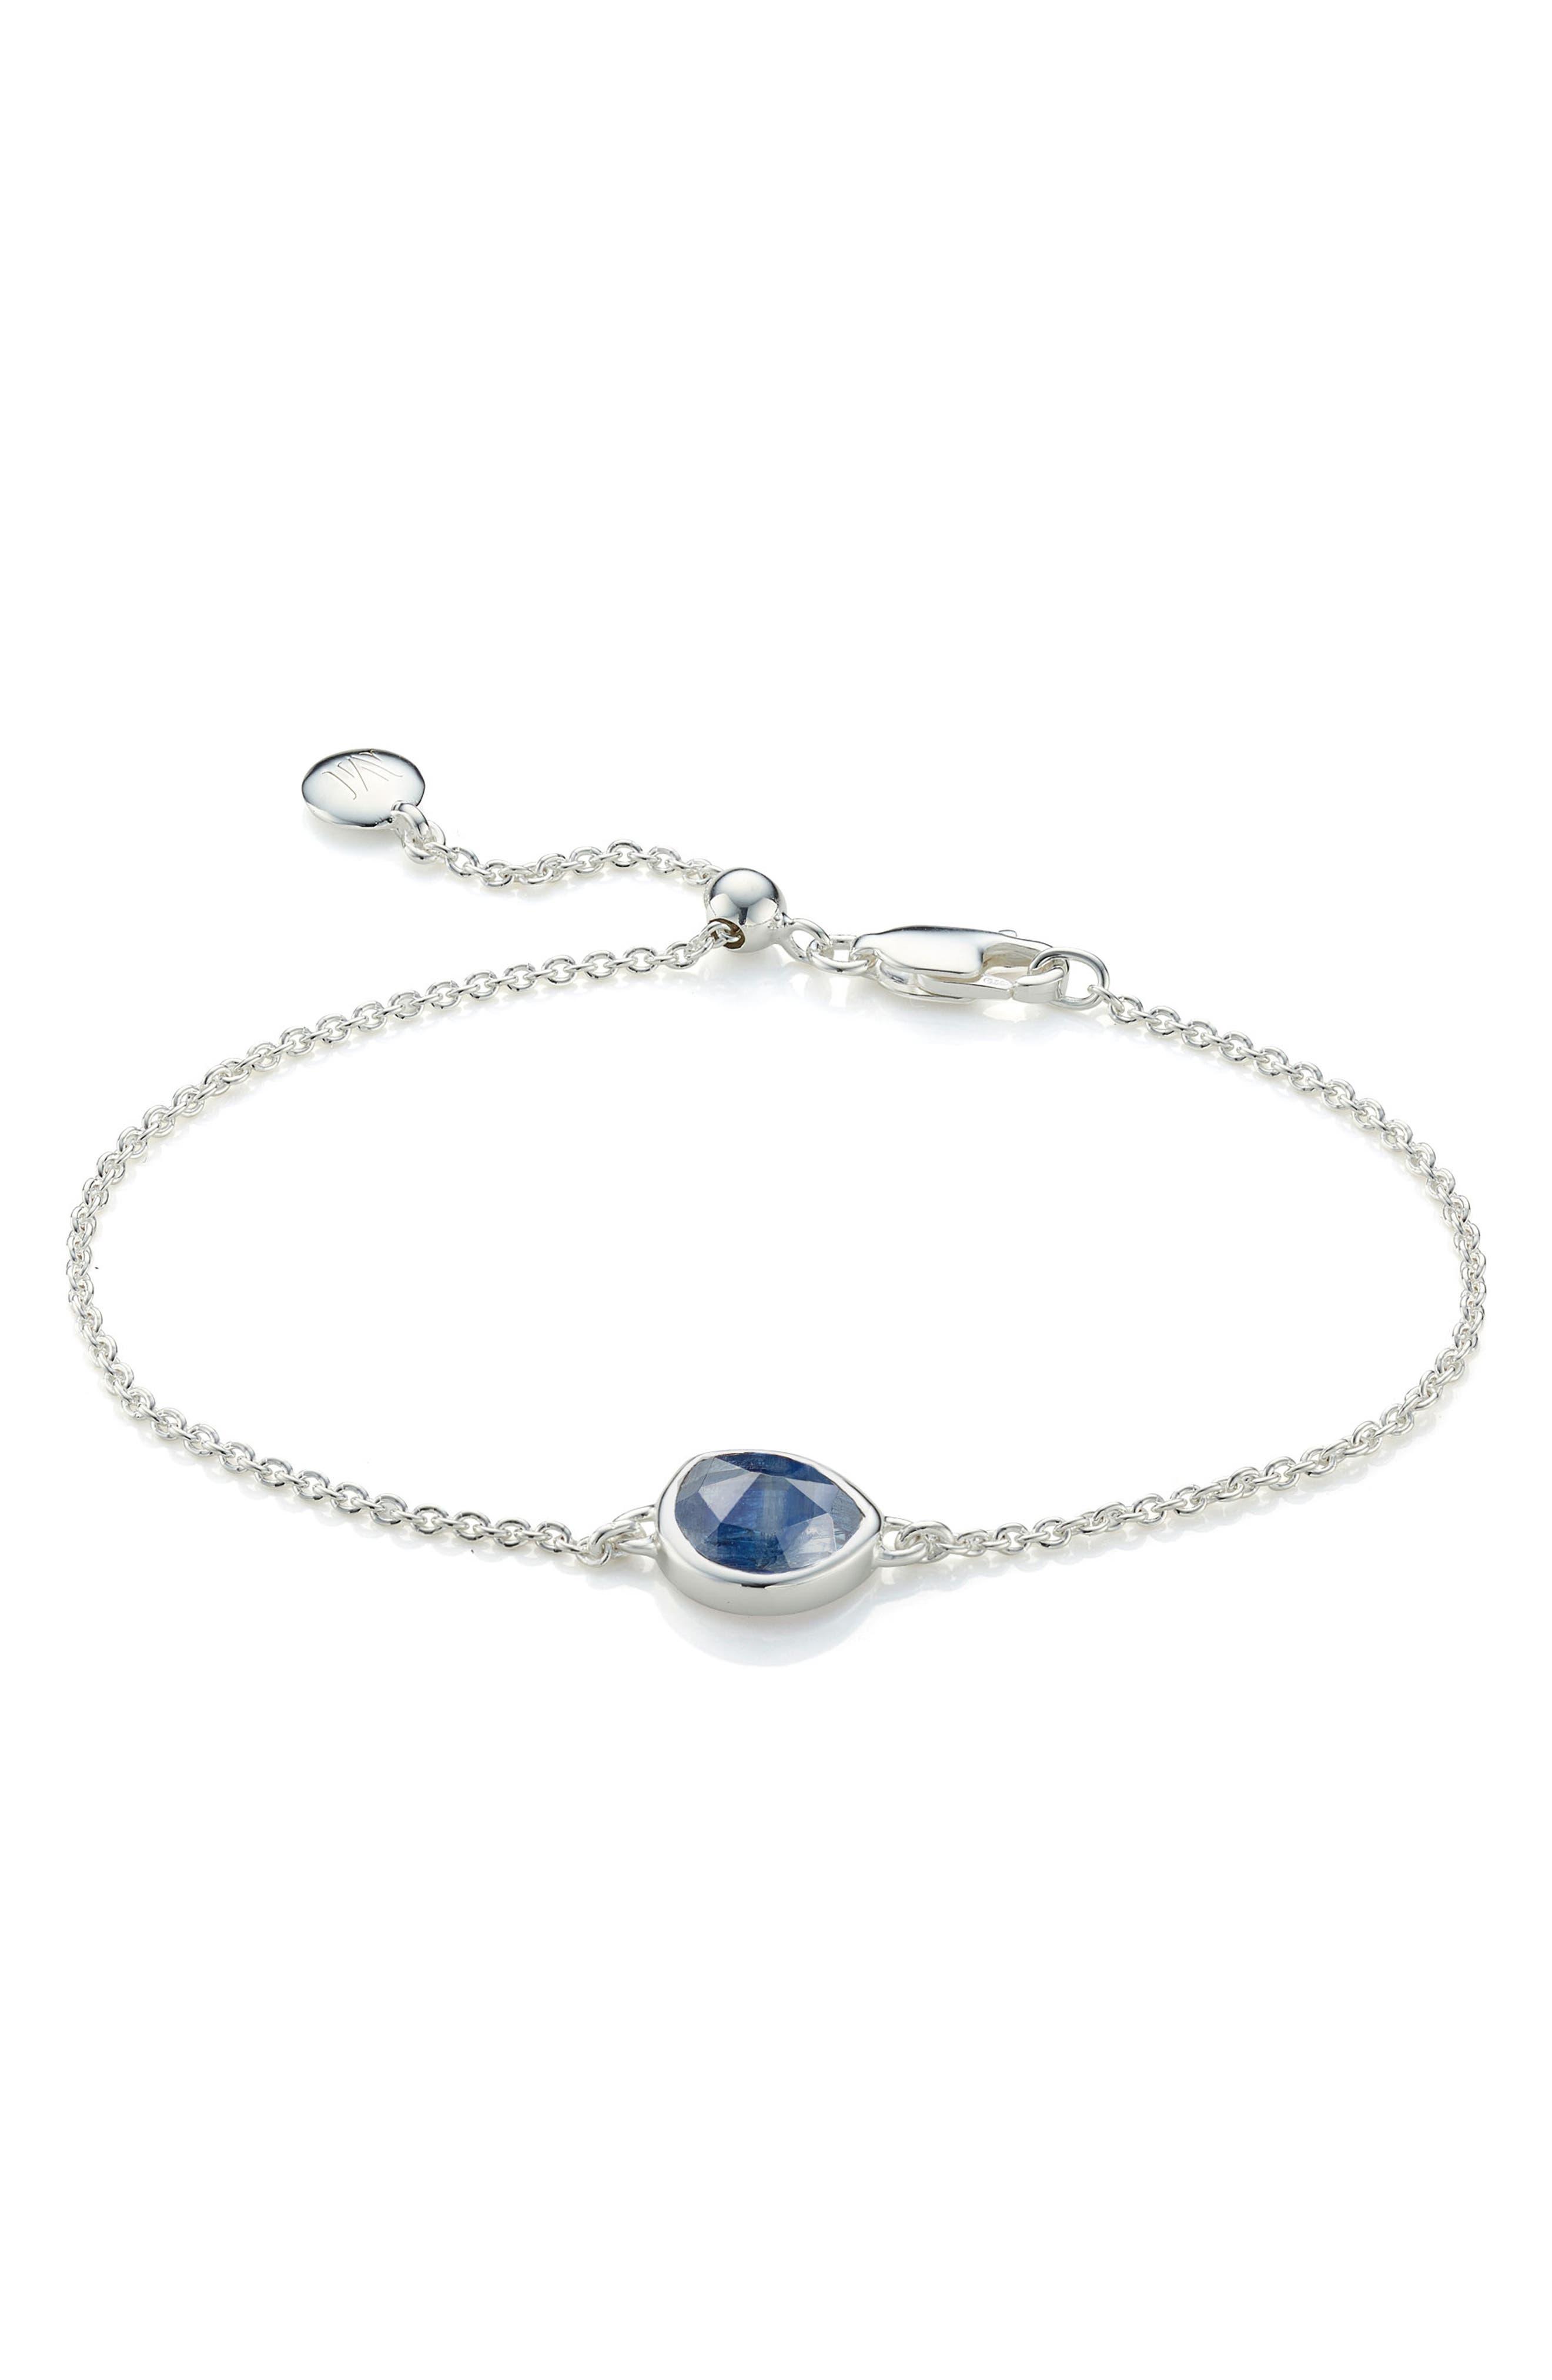 Siren Semiprecious Stone Bracelet,                         Main,                         color, SILVER/ KYANITE